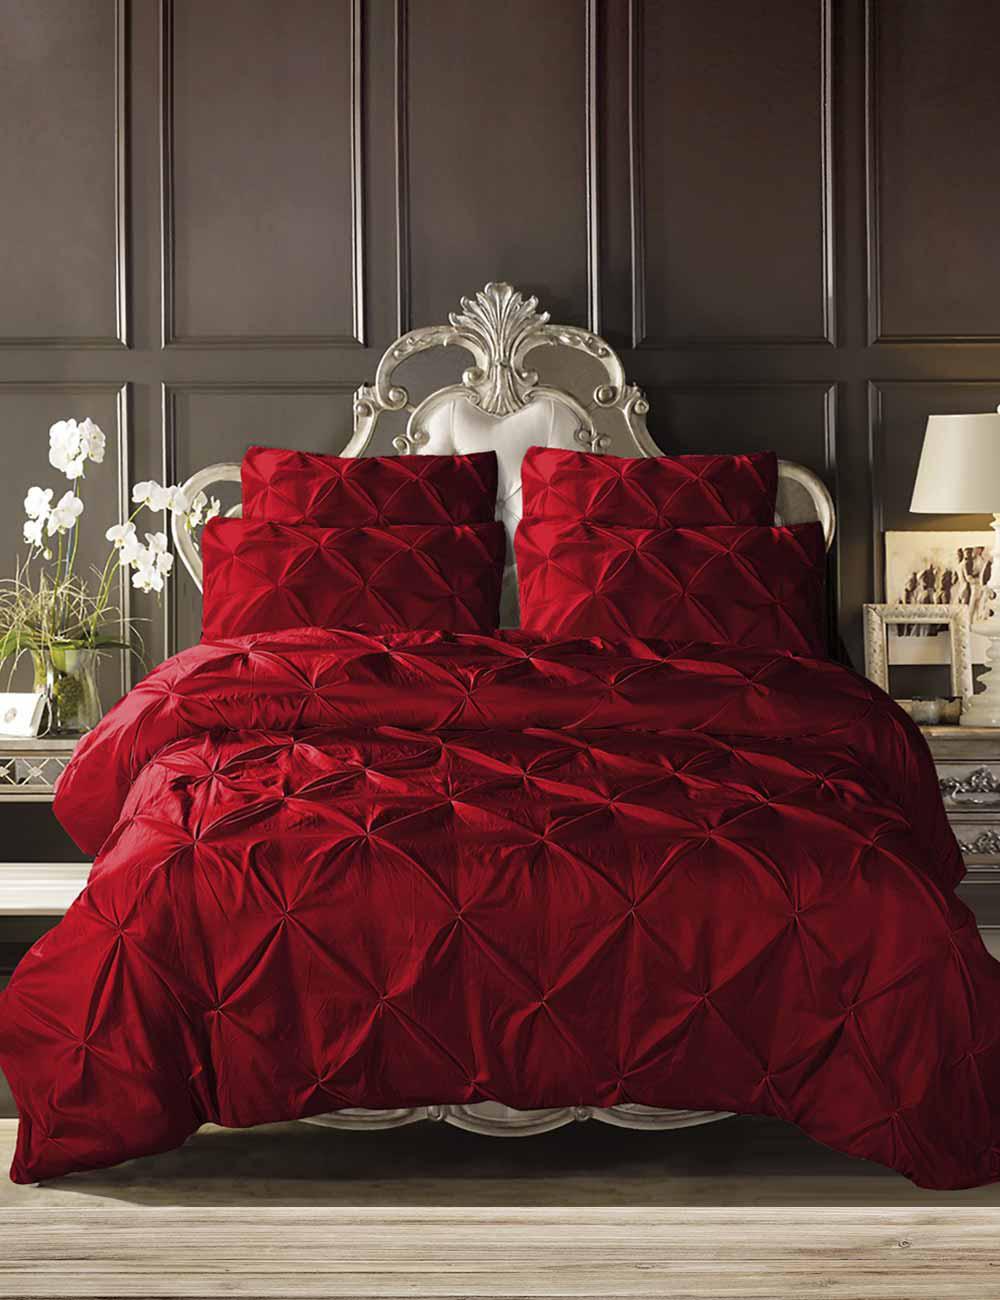 bettw sche pluma mit trendigem federndruck. Black Bedroom Furniture Sets. Home Design Ideas